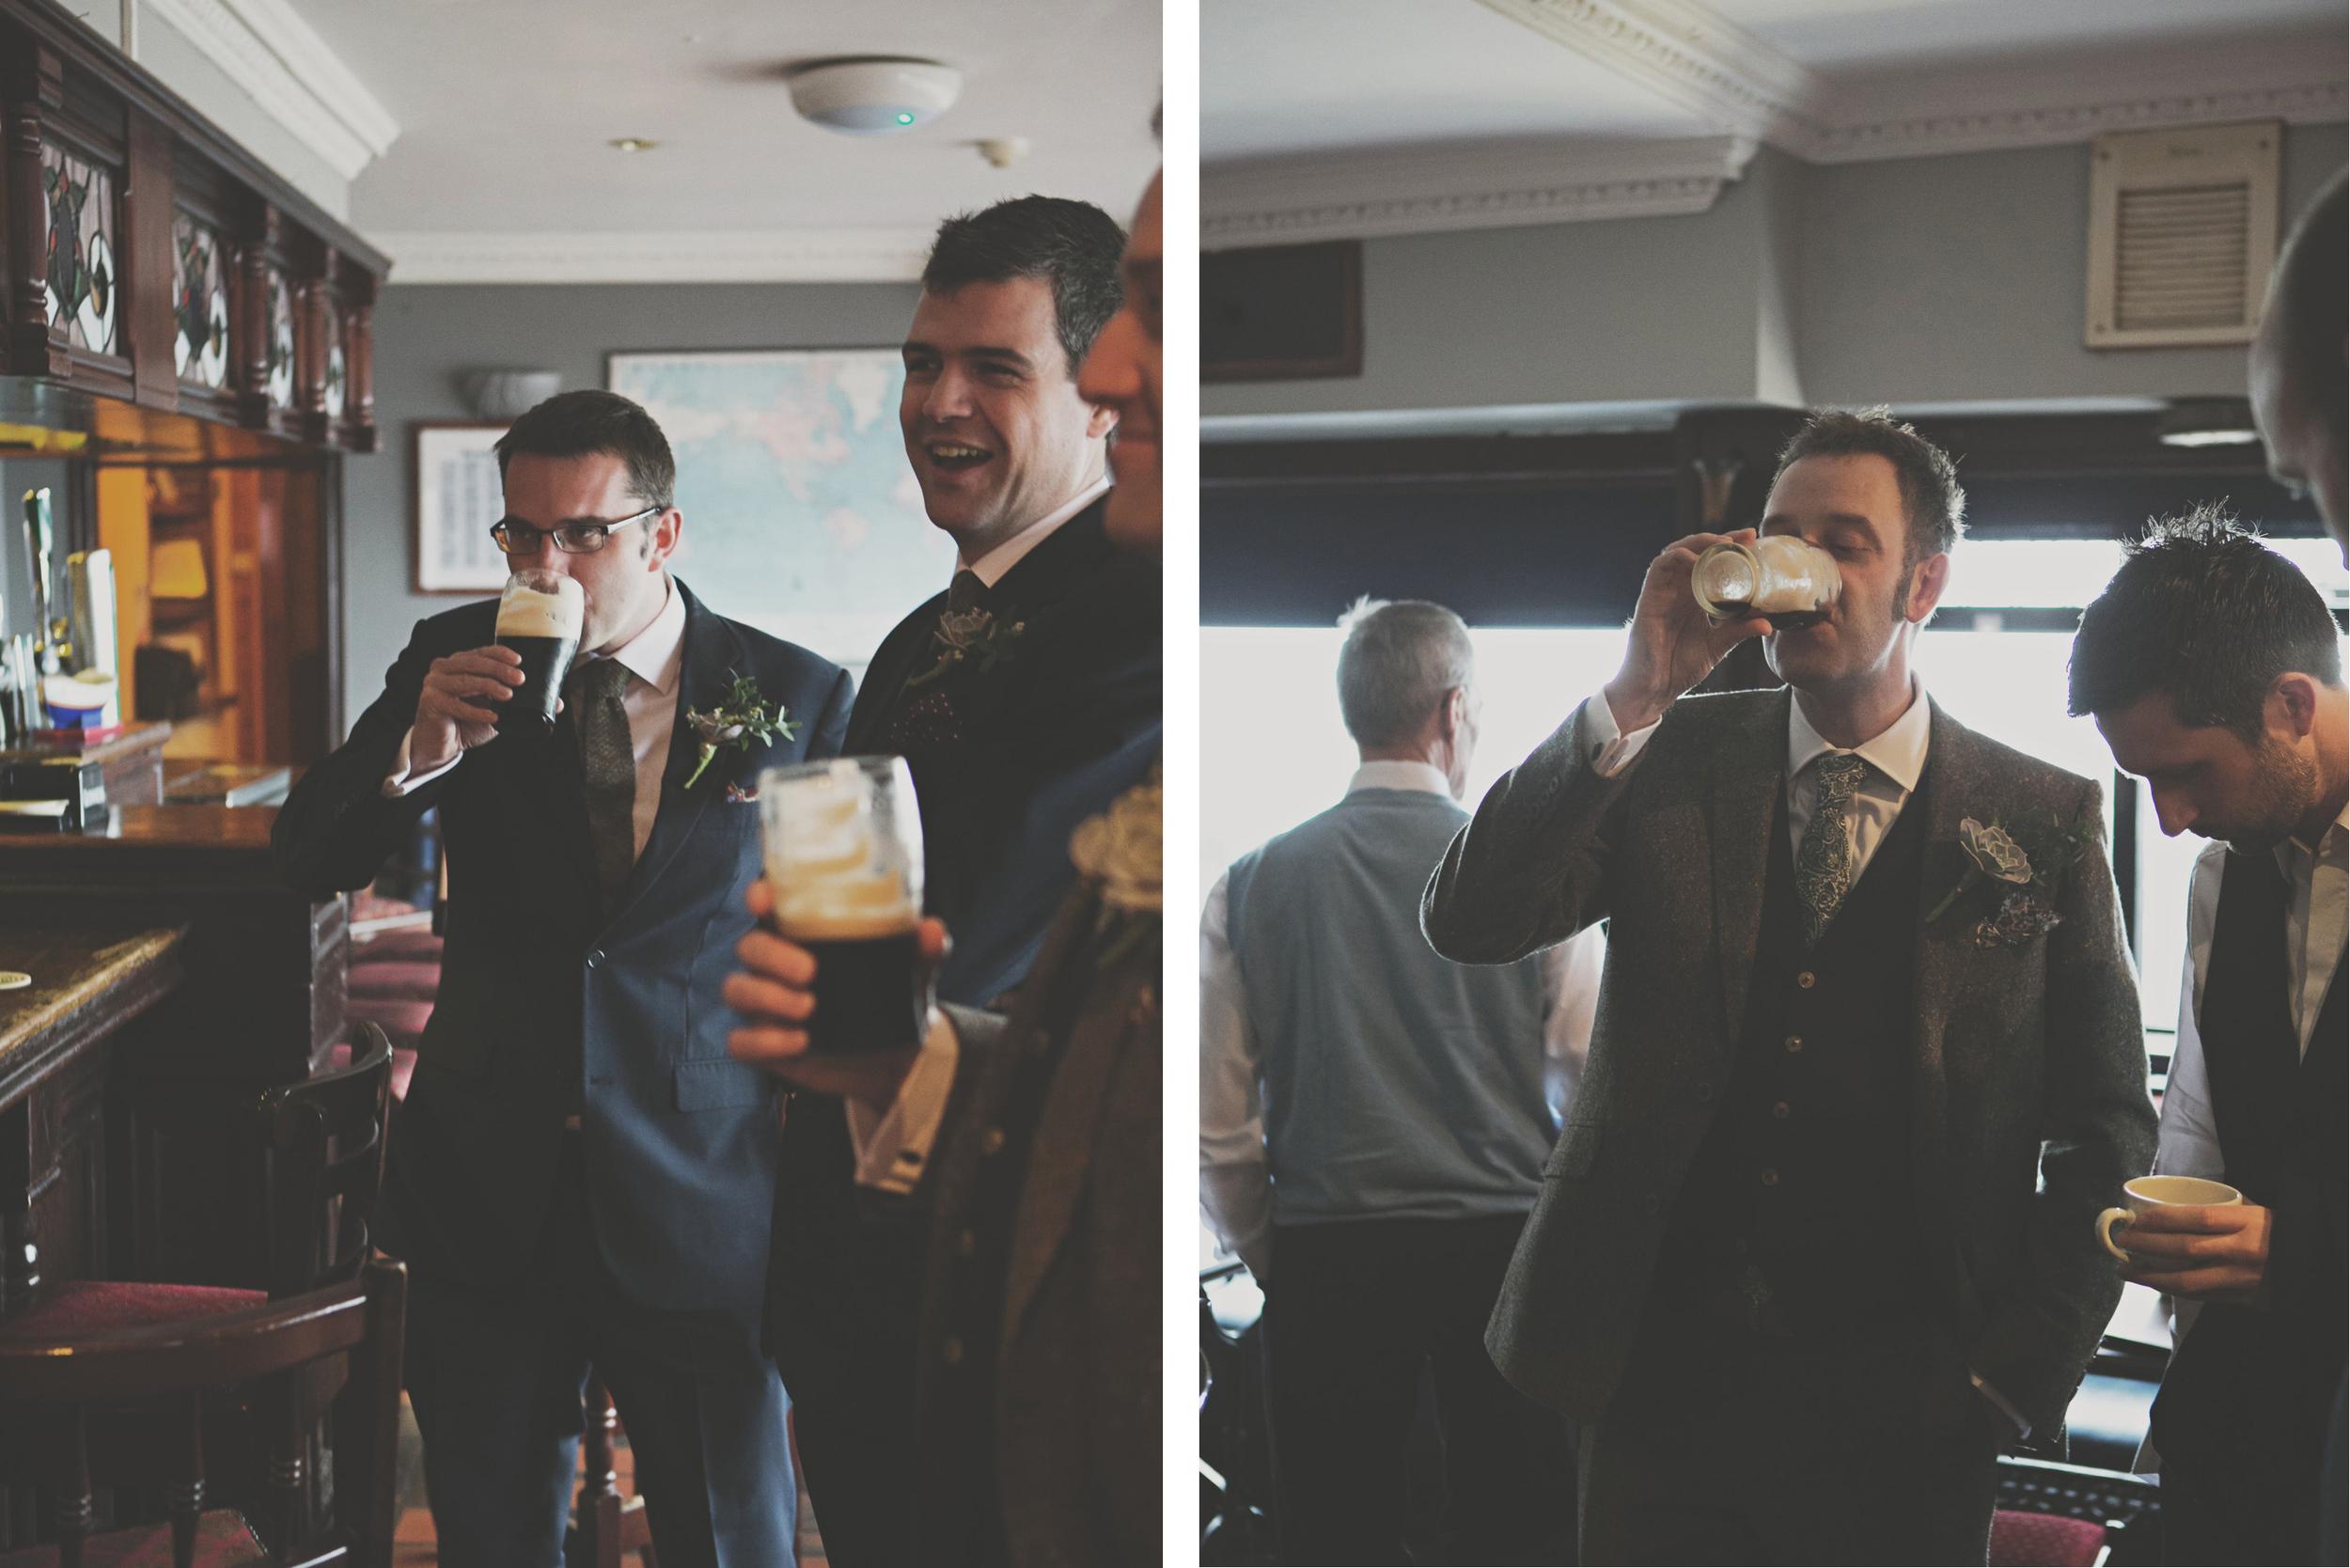 Pints on wedding morning